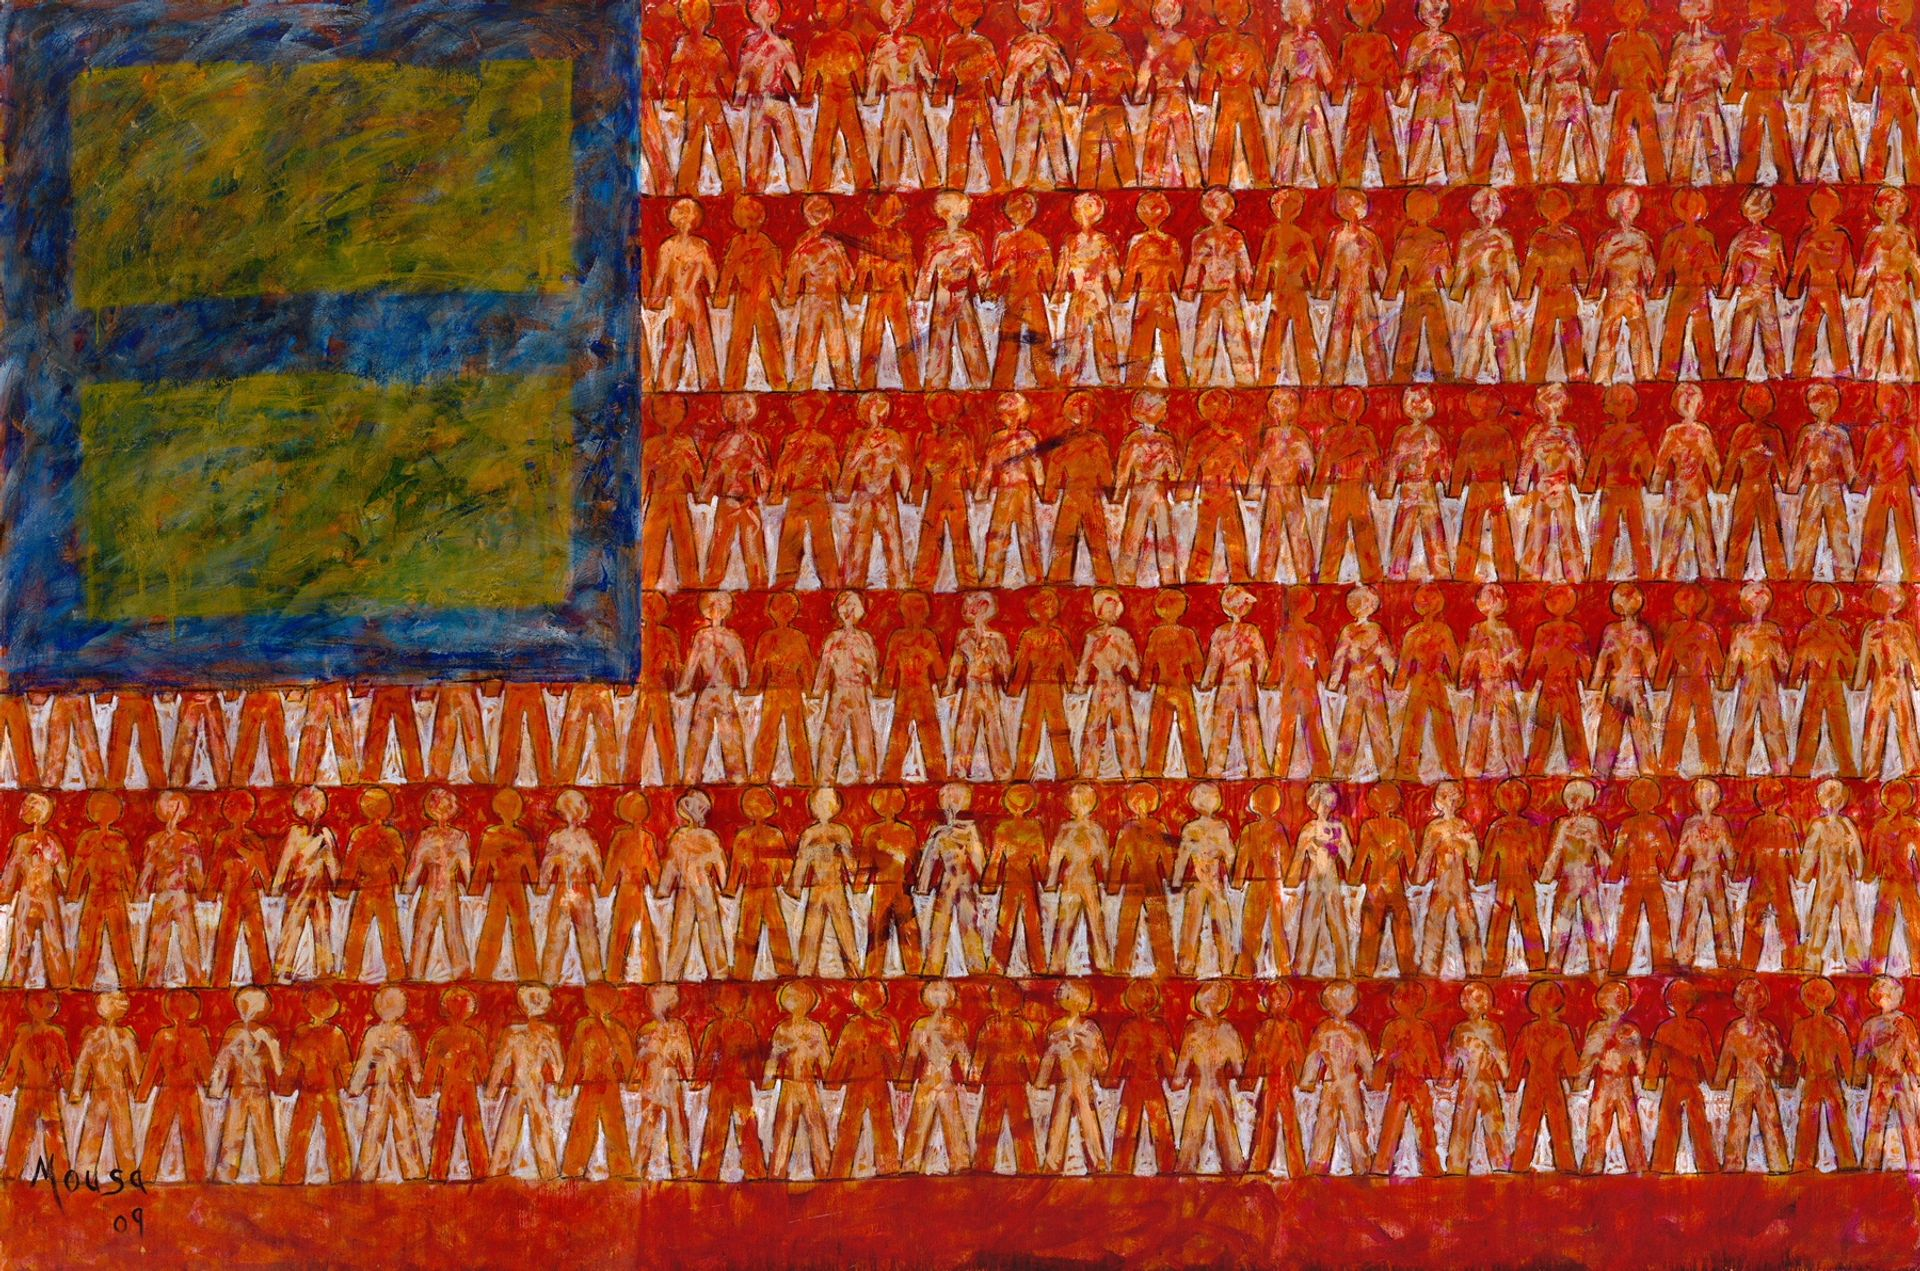 Nabil Mousa's American Landscape #1 (2009) the artist